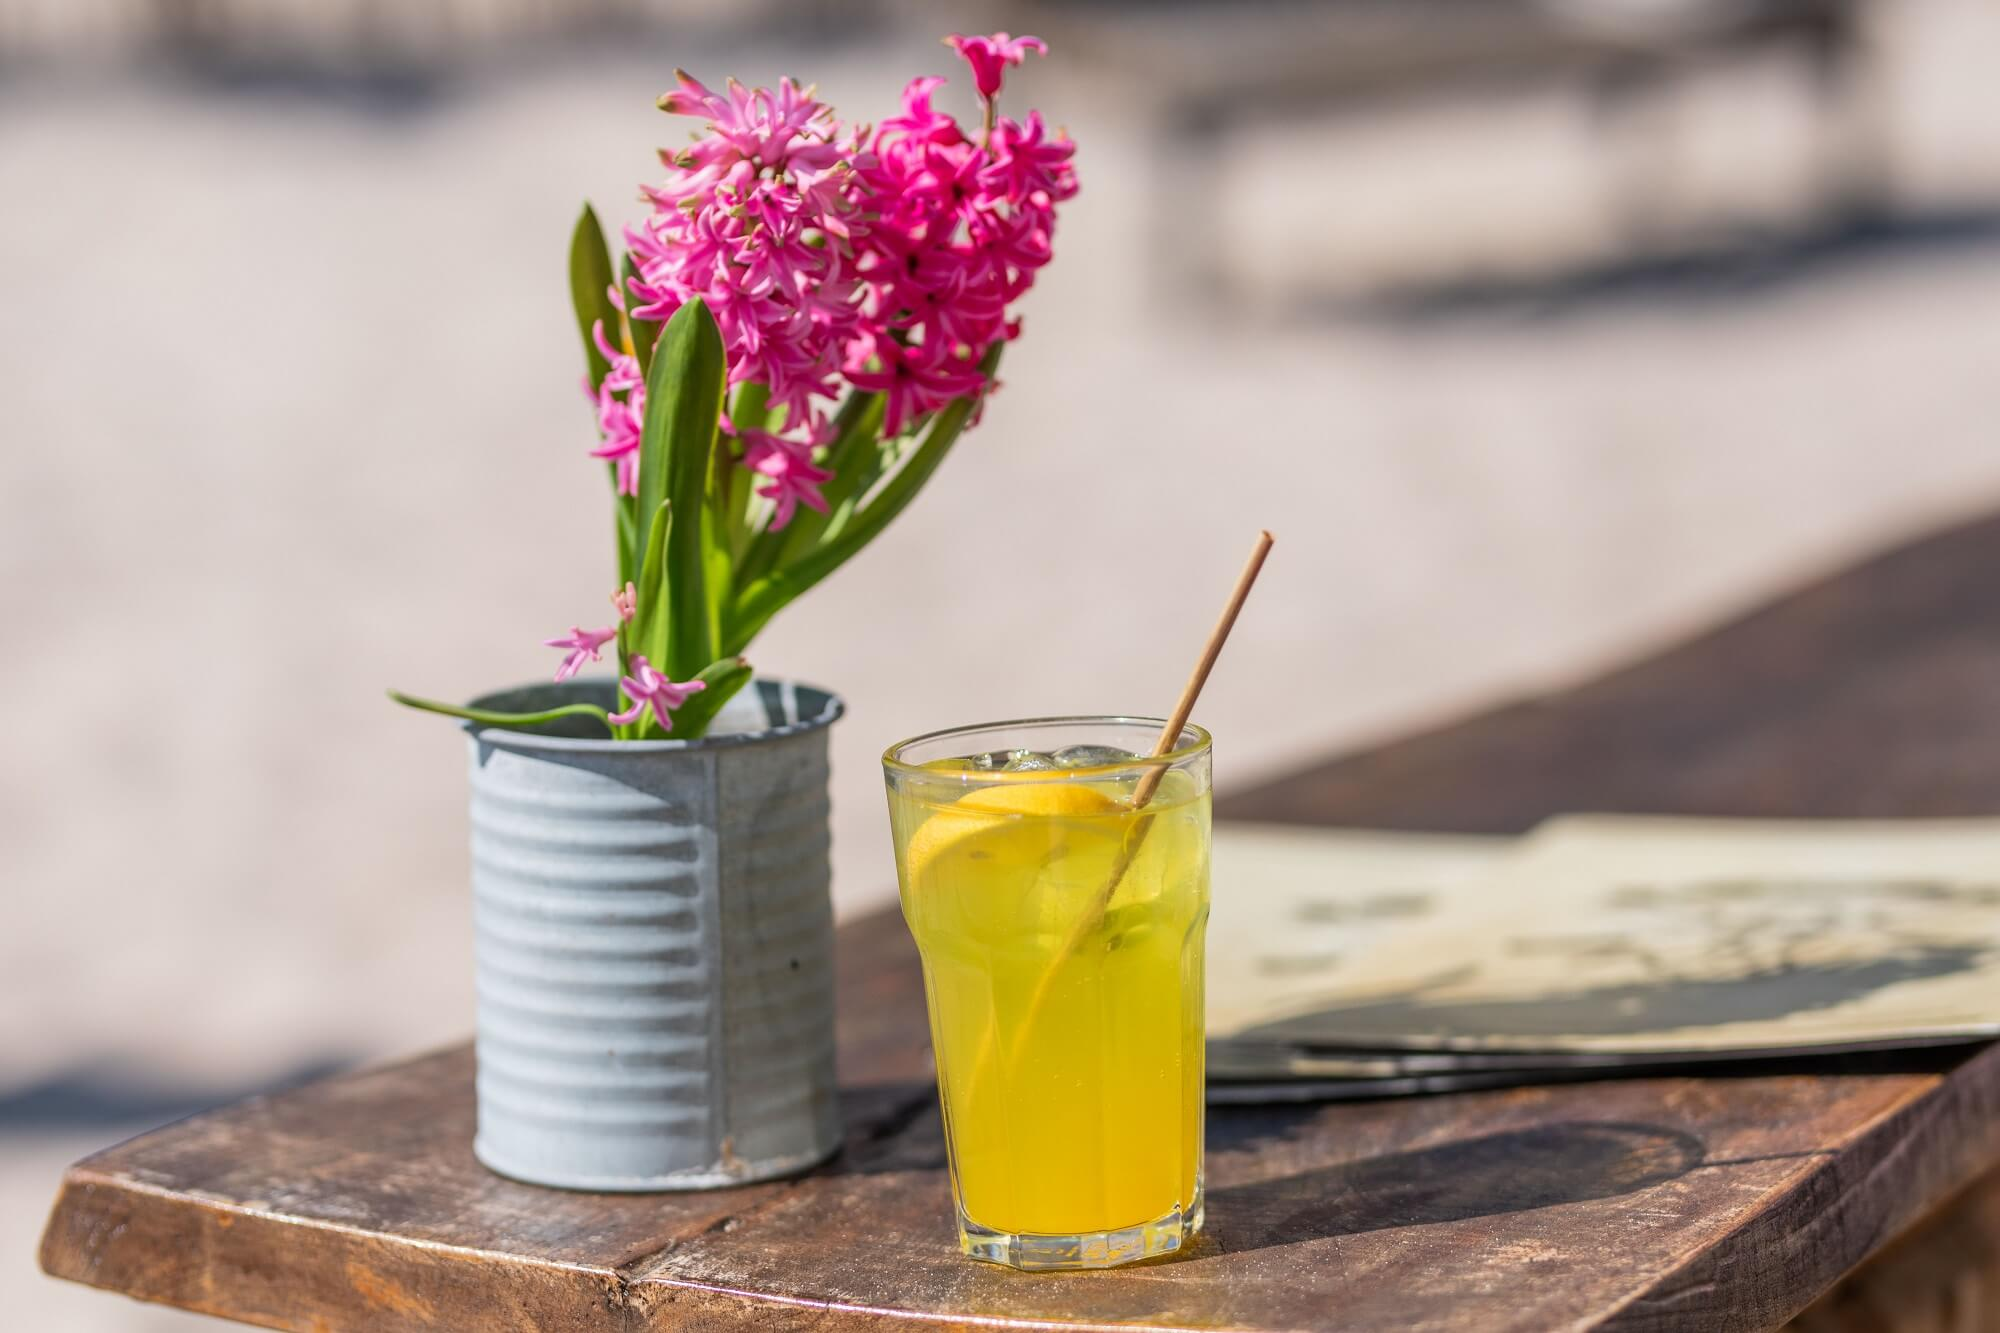 Coole Drinks - Heiße Location